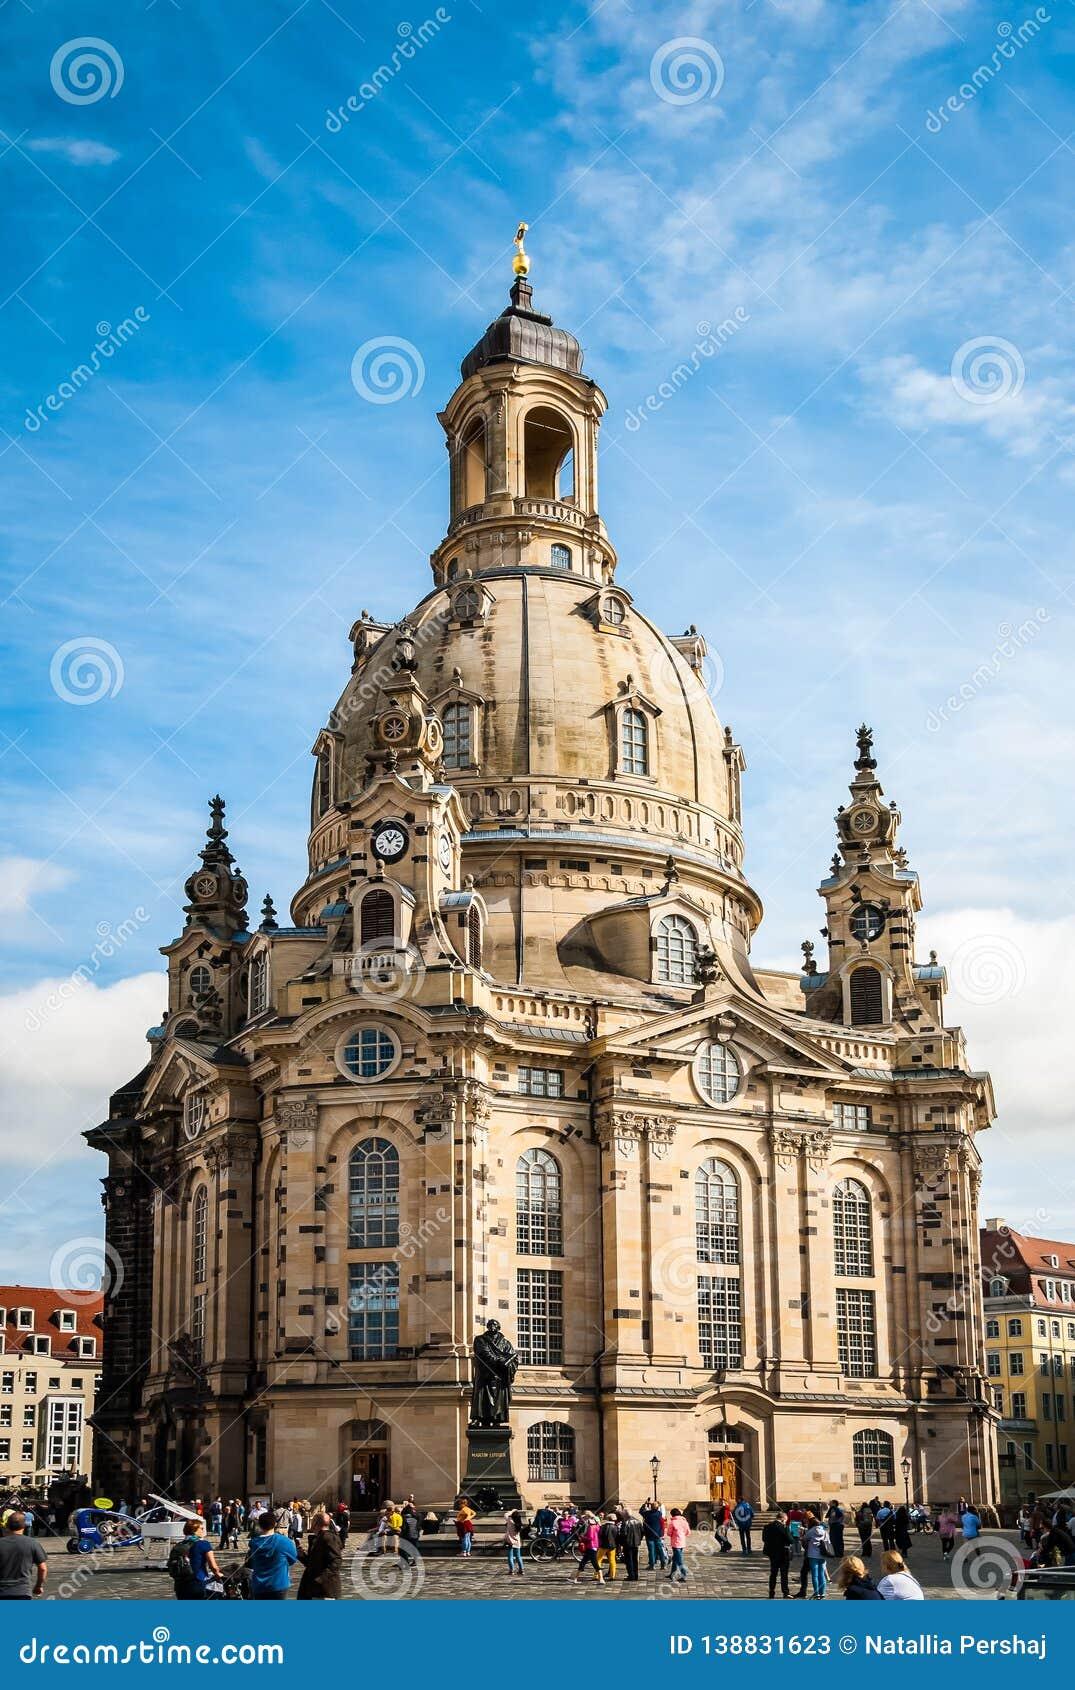 Frauenkirche马丁・路德我们的夫人教会和雕象在老镇的中心在德累斯顿,德国